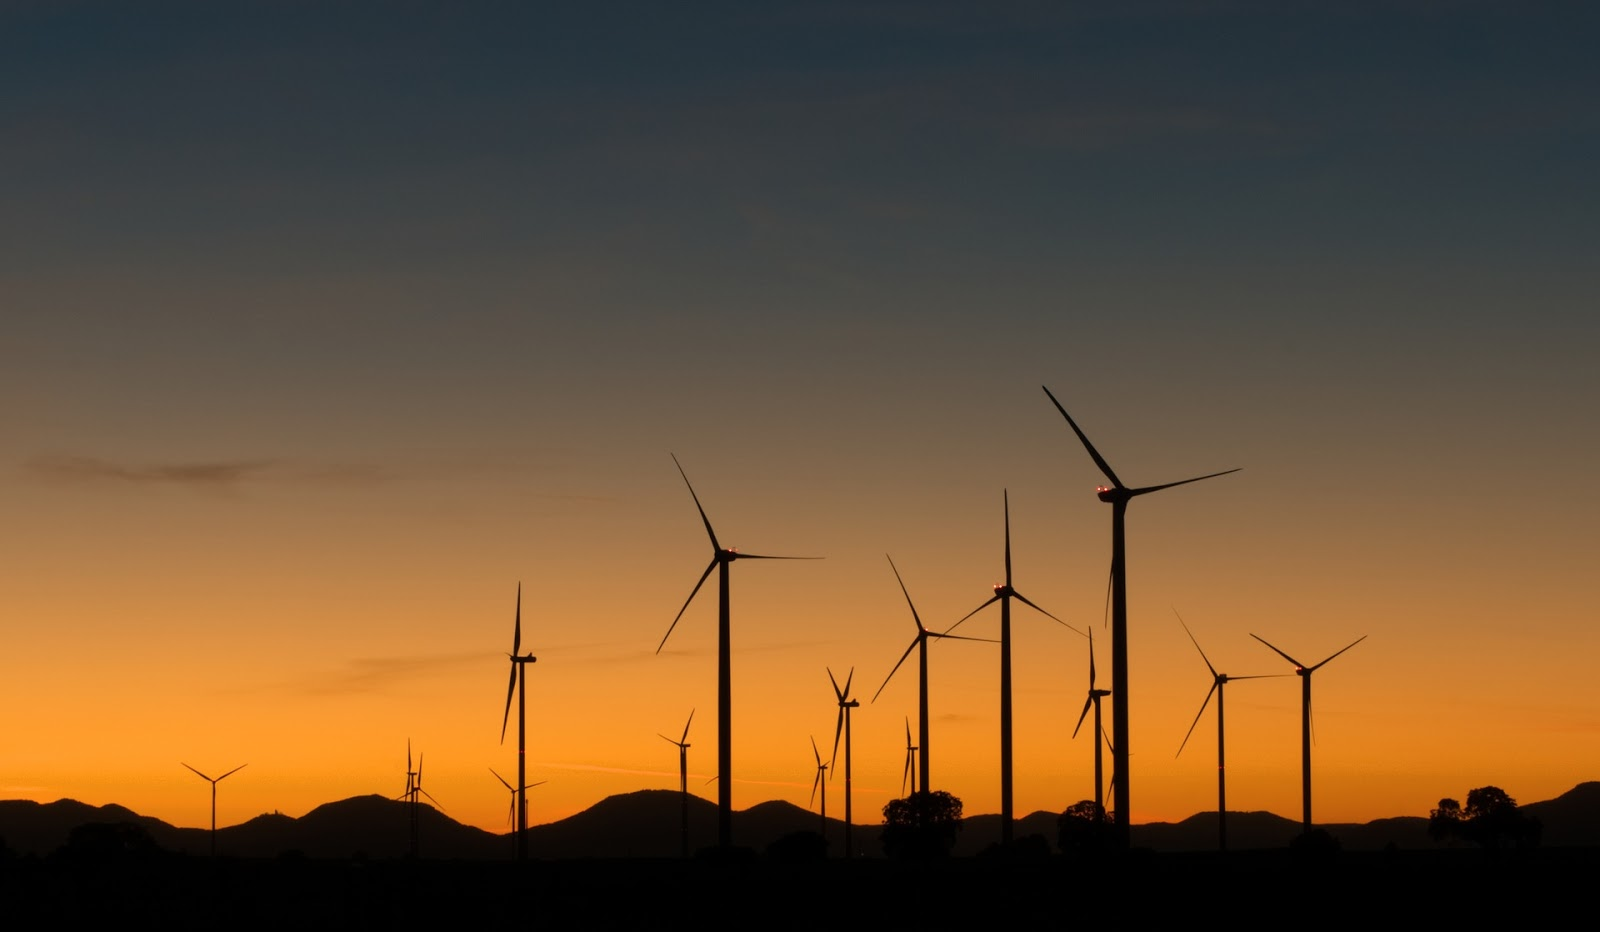 energías-renovables-espana-latinoamerica